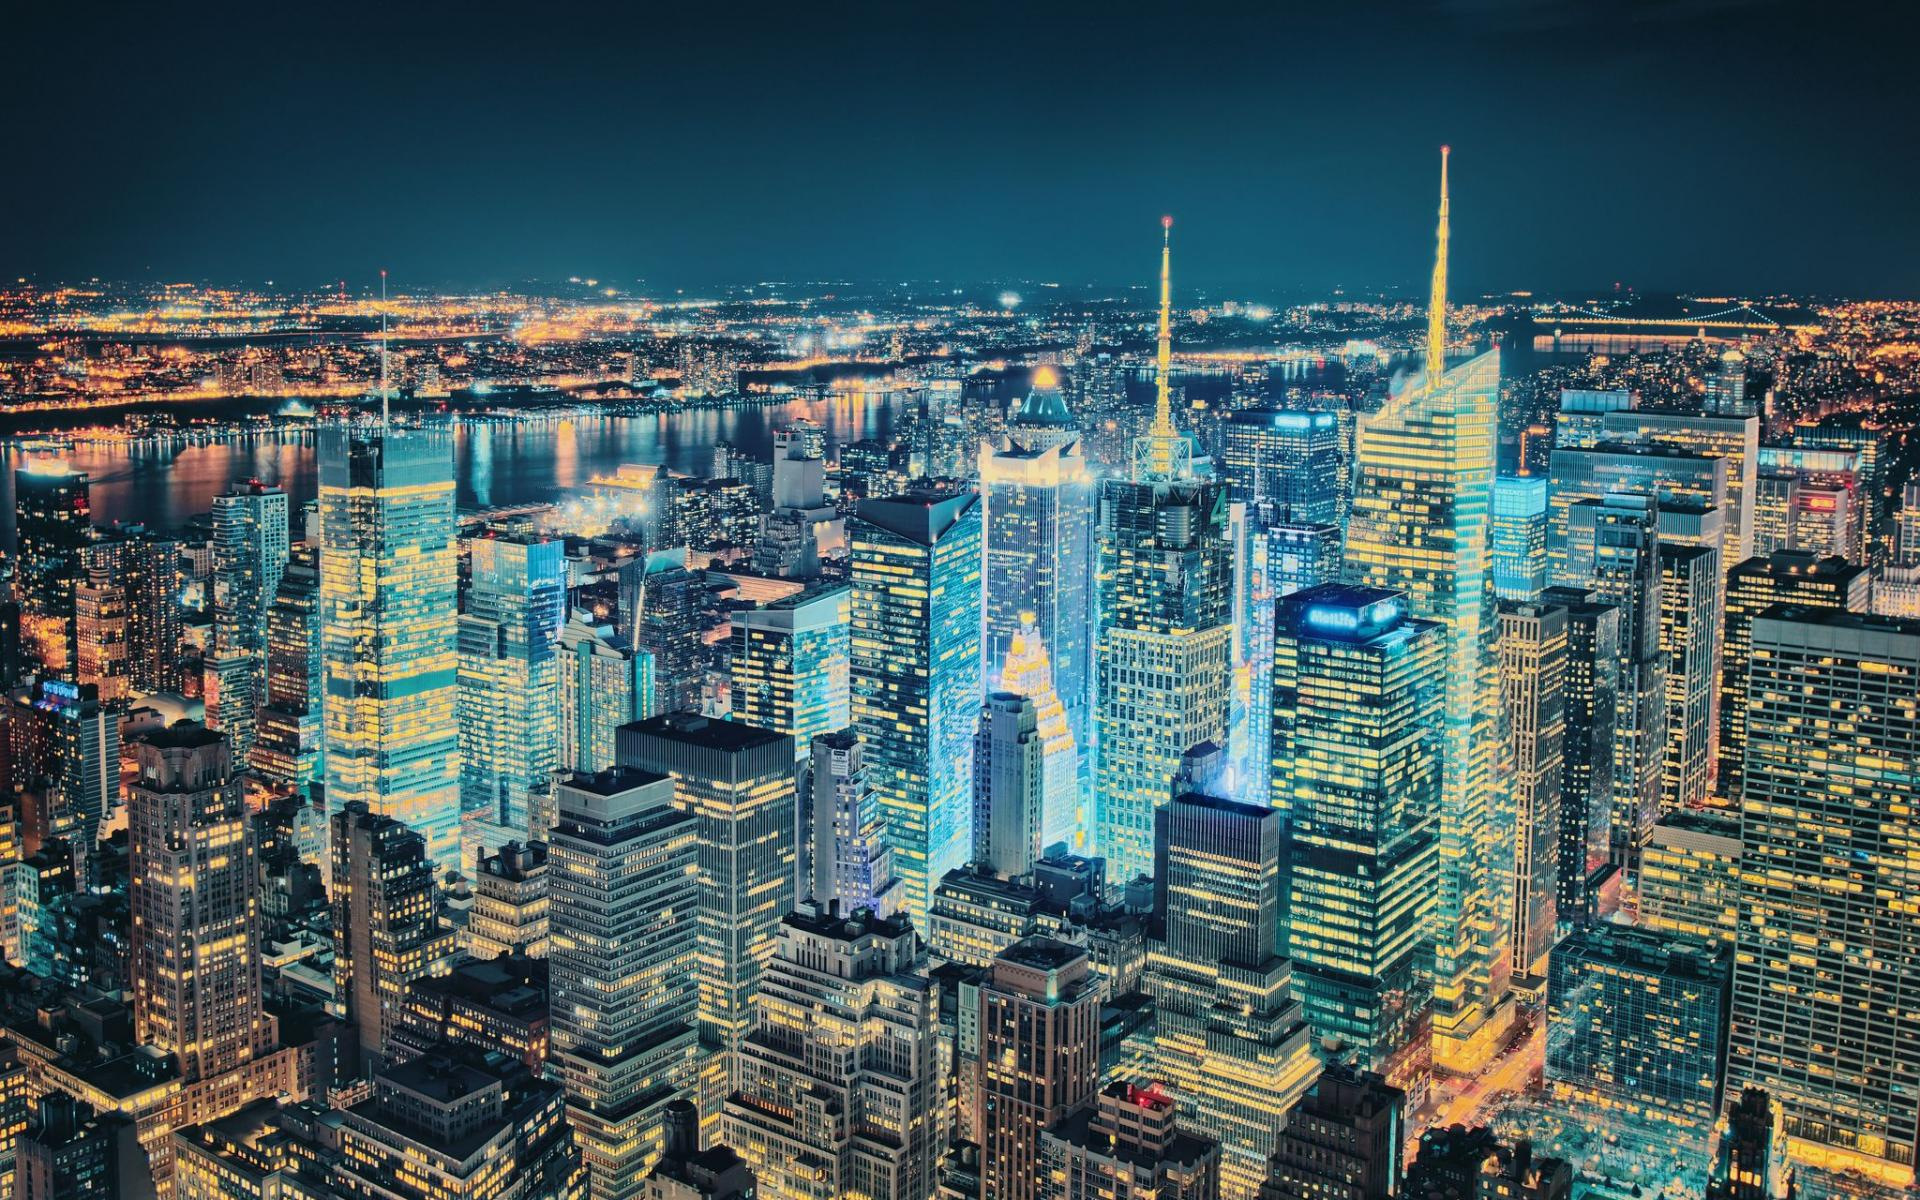 Fantasy Girl Wallpaper 1080p New York City Full Hd Desktop Wallpapers 1080p